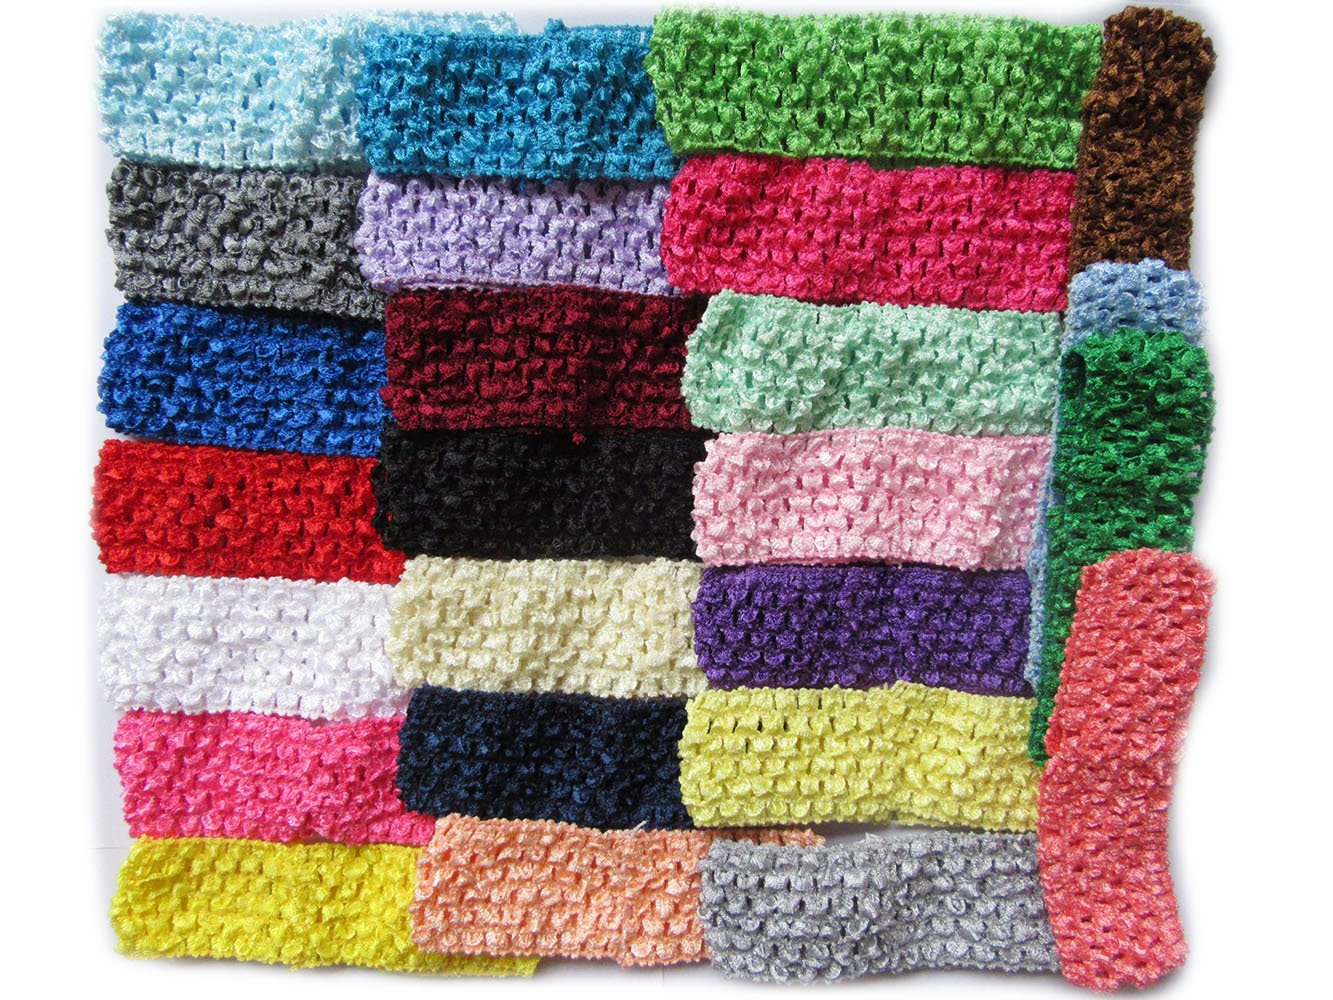 Amazoncom 50 Pcs Elastic Crochet Headbands For Newborn Infant